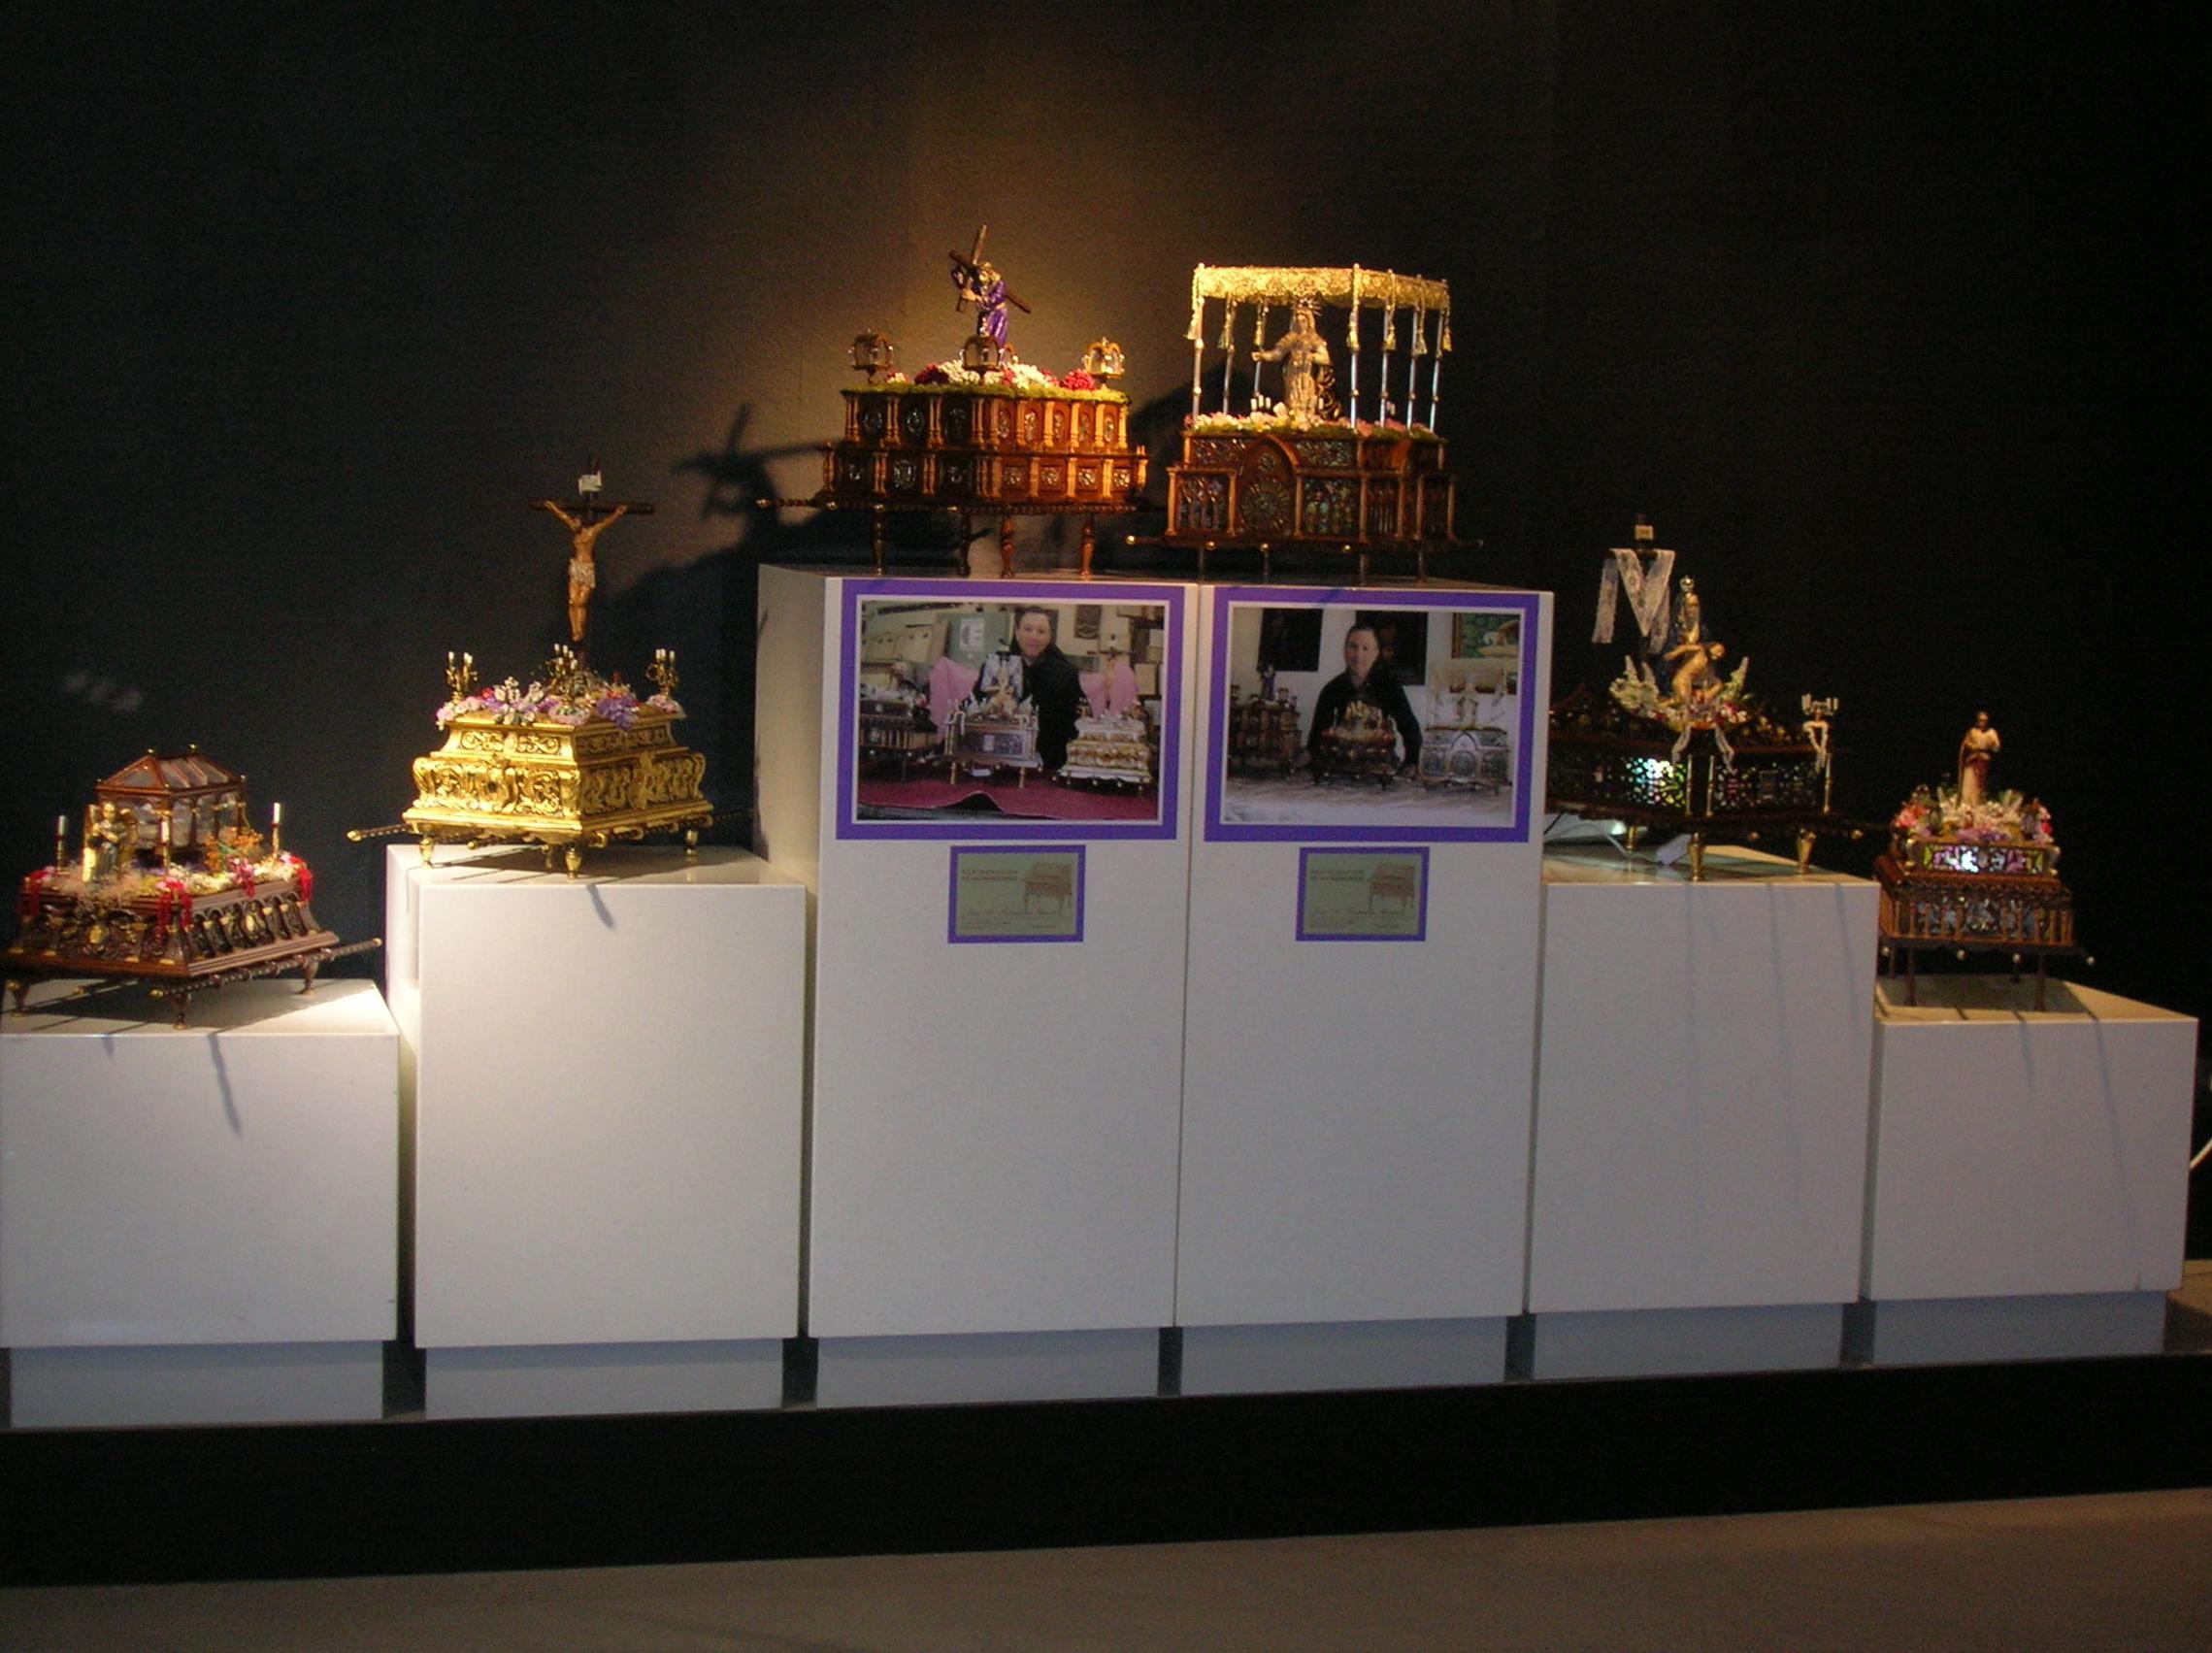 exposiccion de mis tronos de semana santa  en miniatura